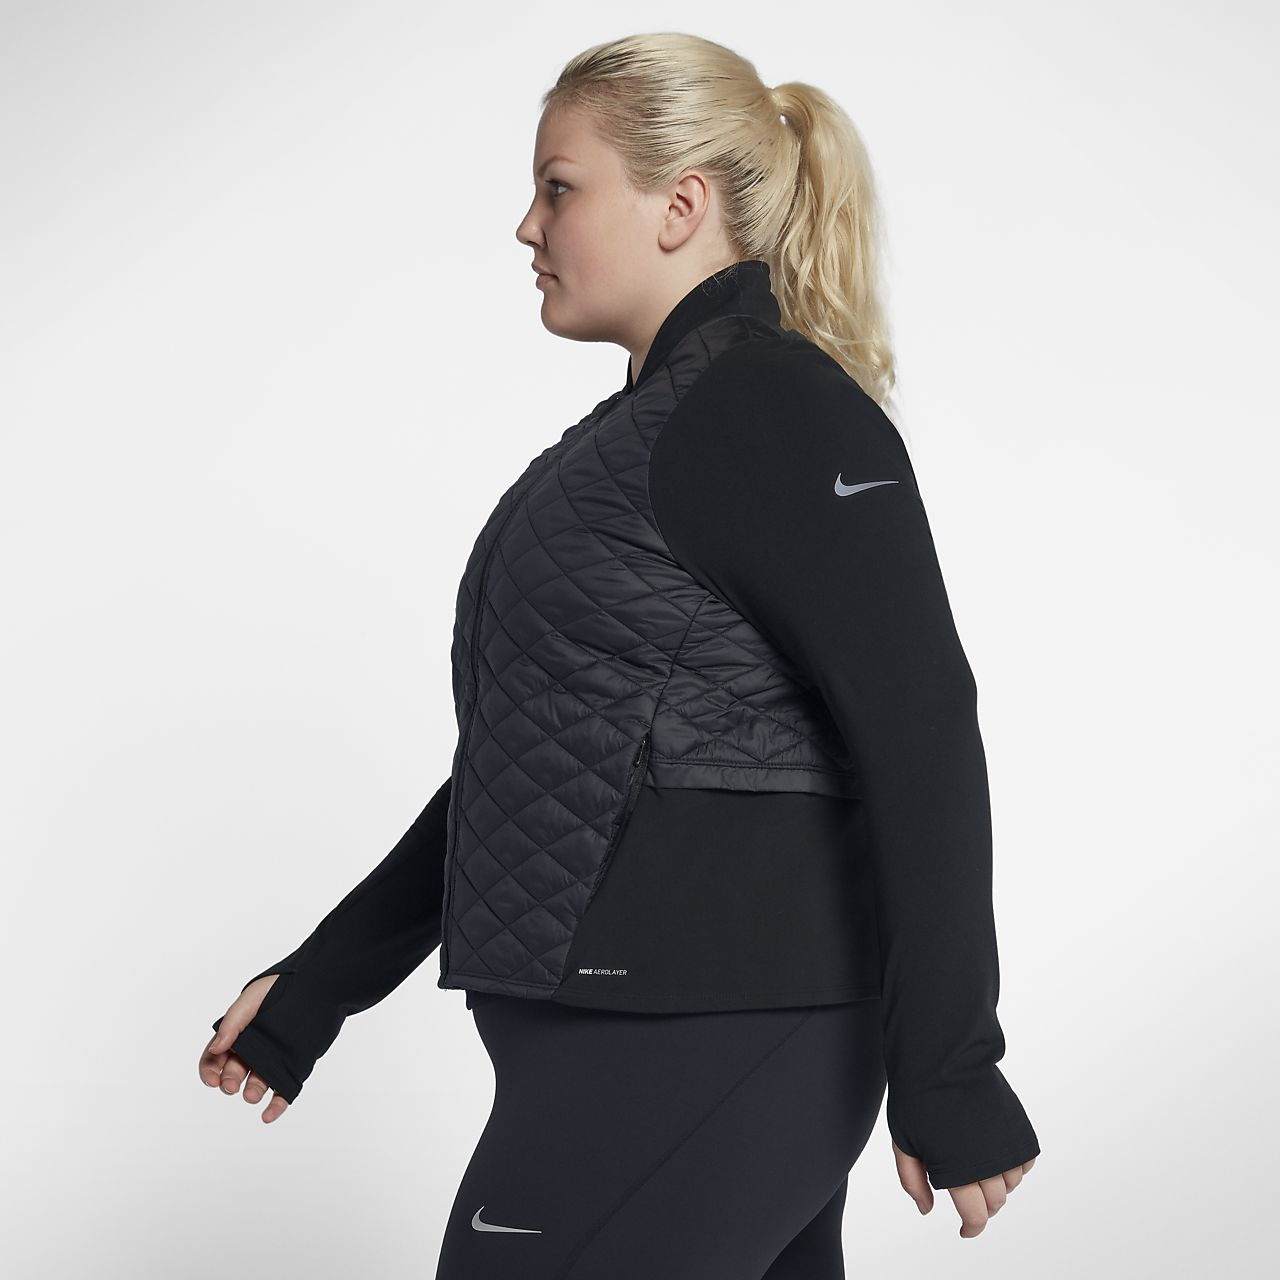 De Running Nike grande Aerolayer Veste Femme Pour Ca Taille 6dKyAAZSqW